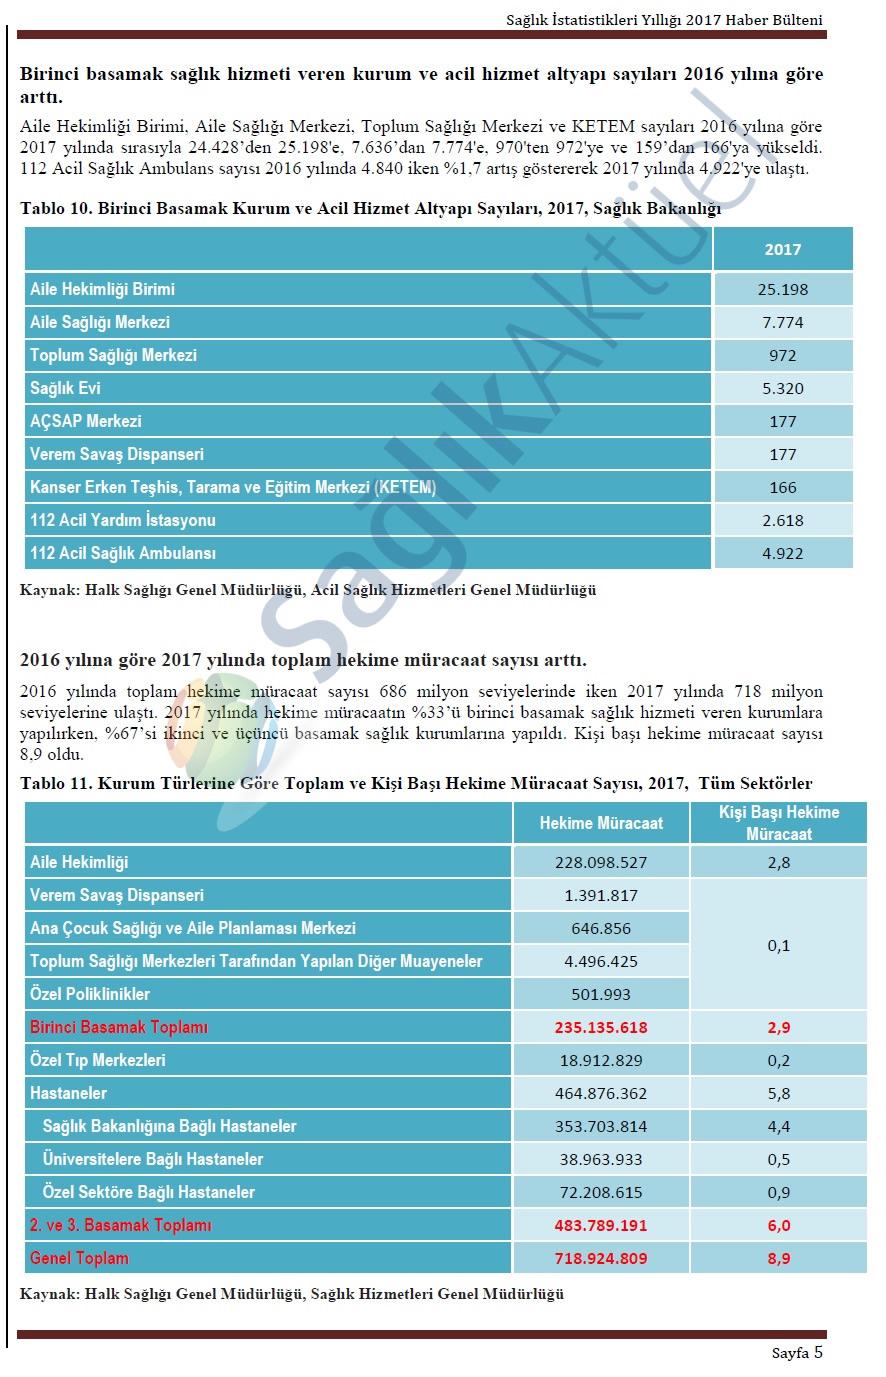 saglik-istatistikleri-yilligi-2016-5-001.jpg